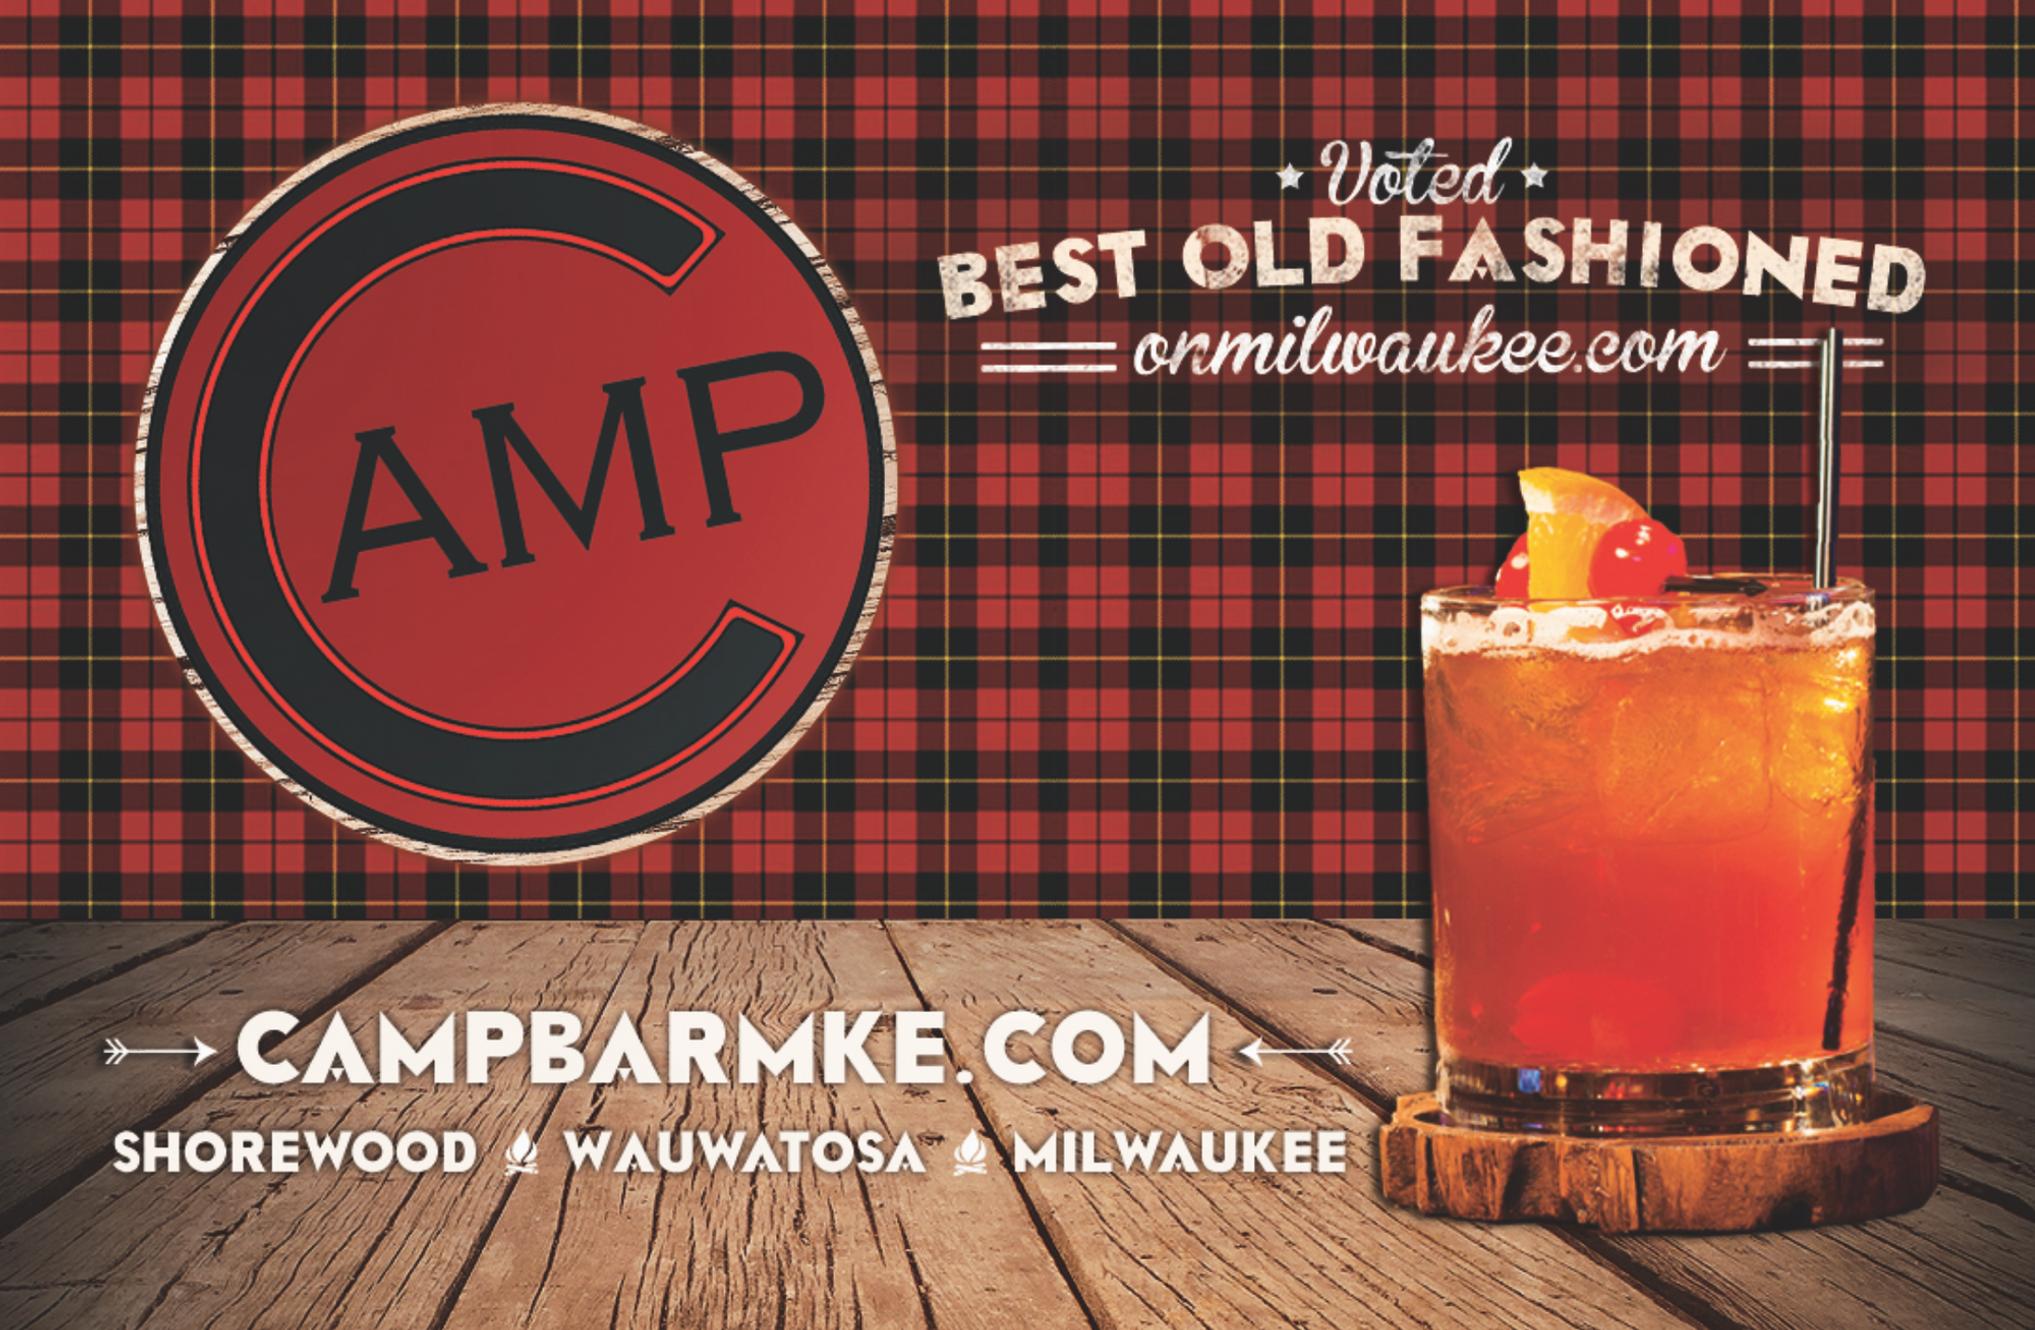 CAMP CARES   Campbarmke   Milwaukee   www campbarmke com